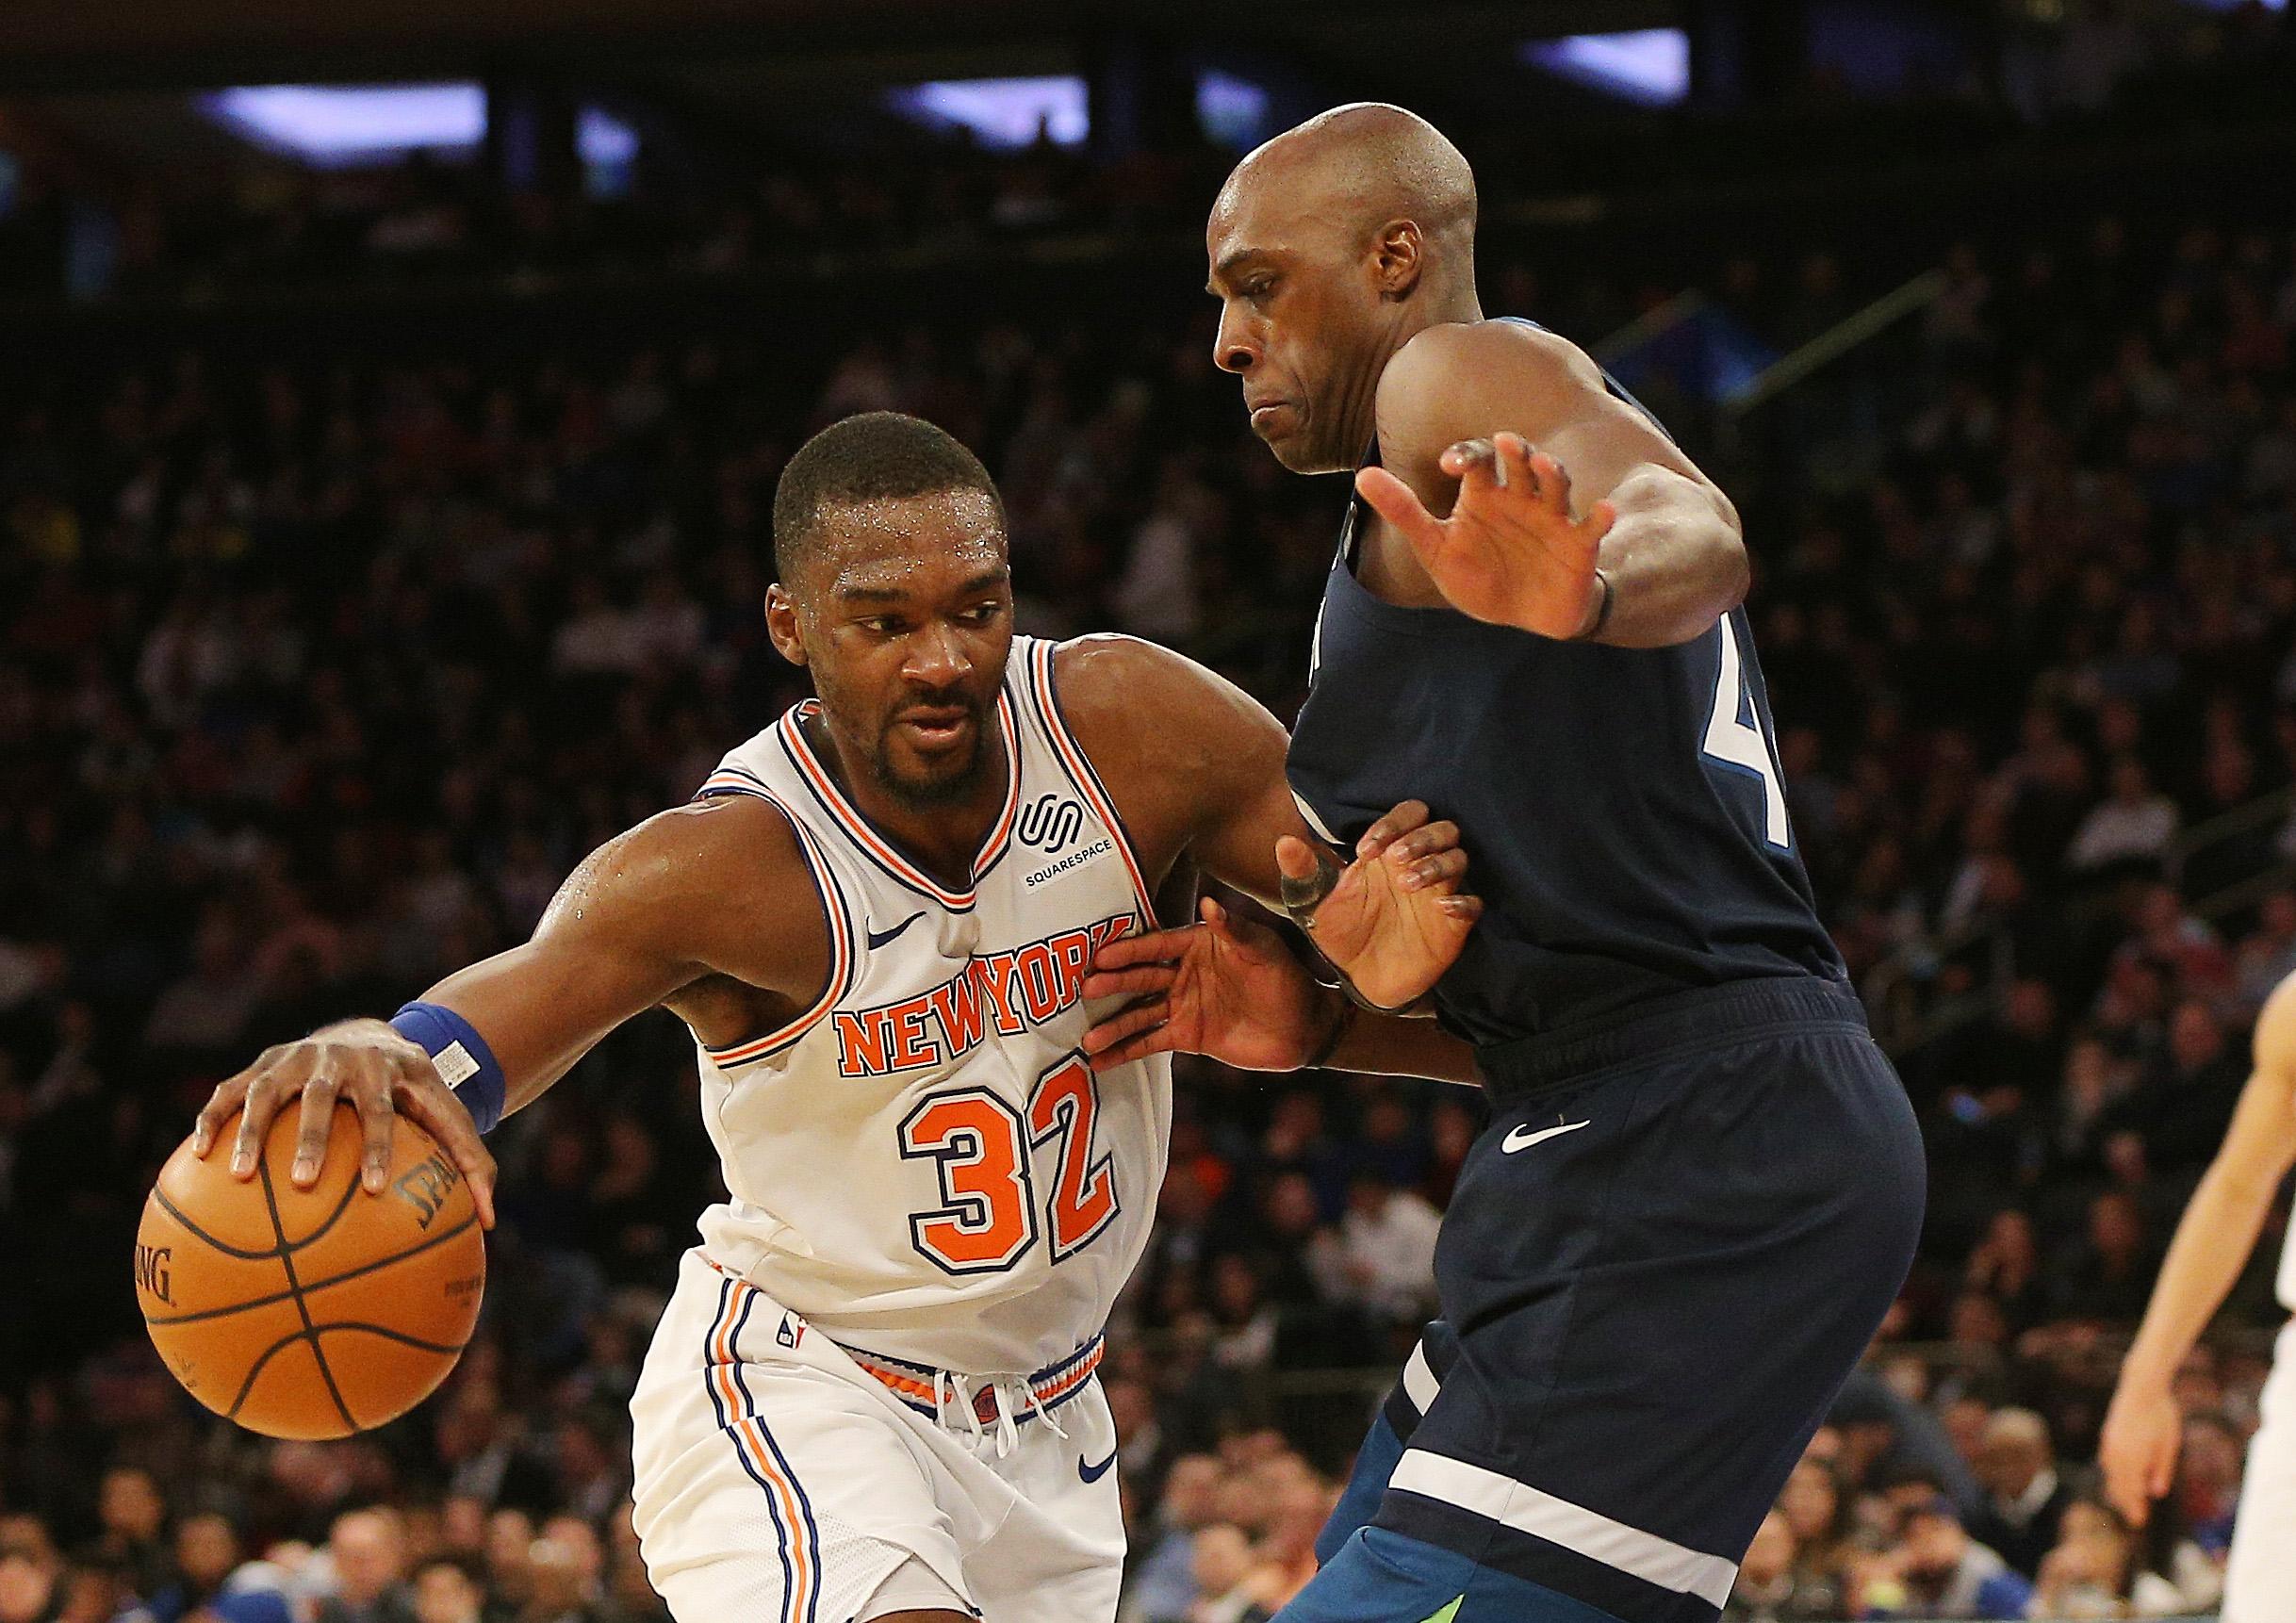 NBA: Minnesota Timberwolves at New York Knicks